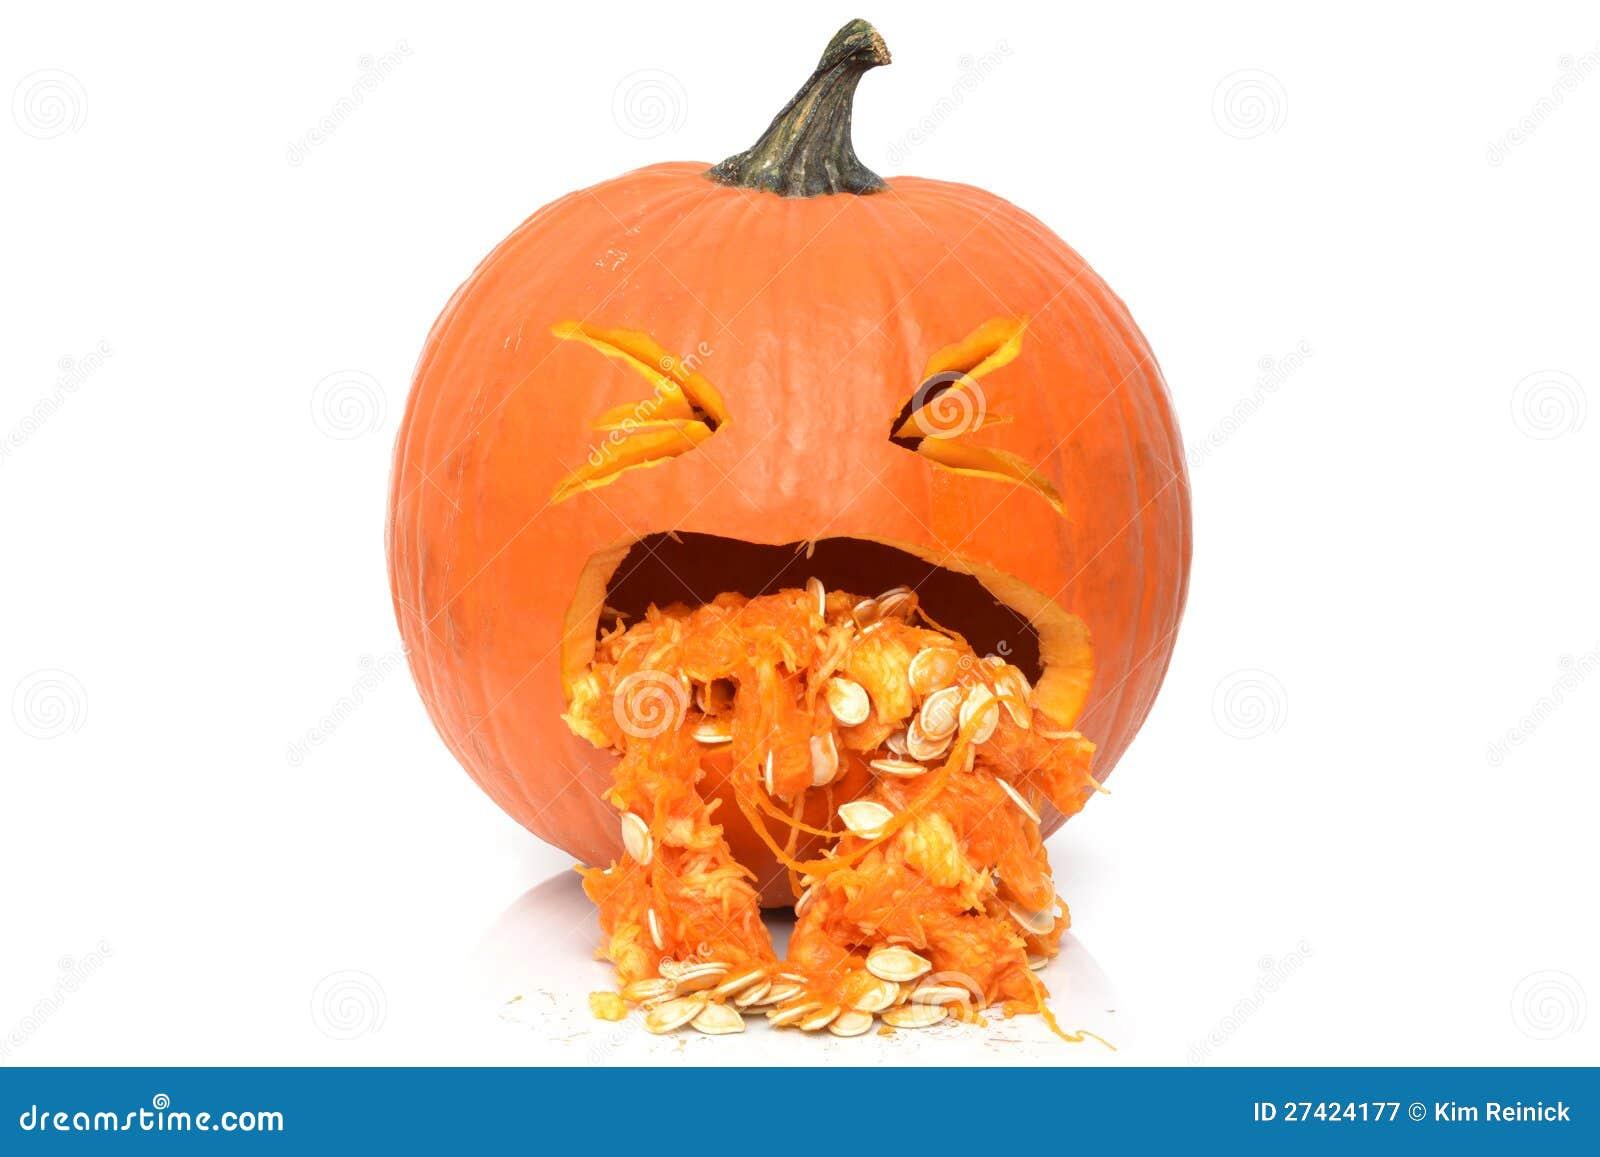 Sick Pumpkin Royalty Free Stock Photography - Image: 27424177